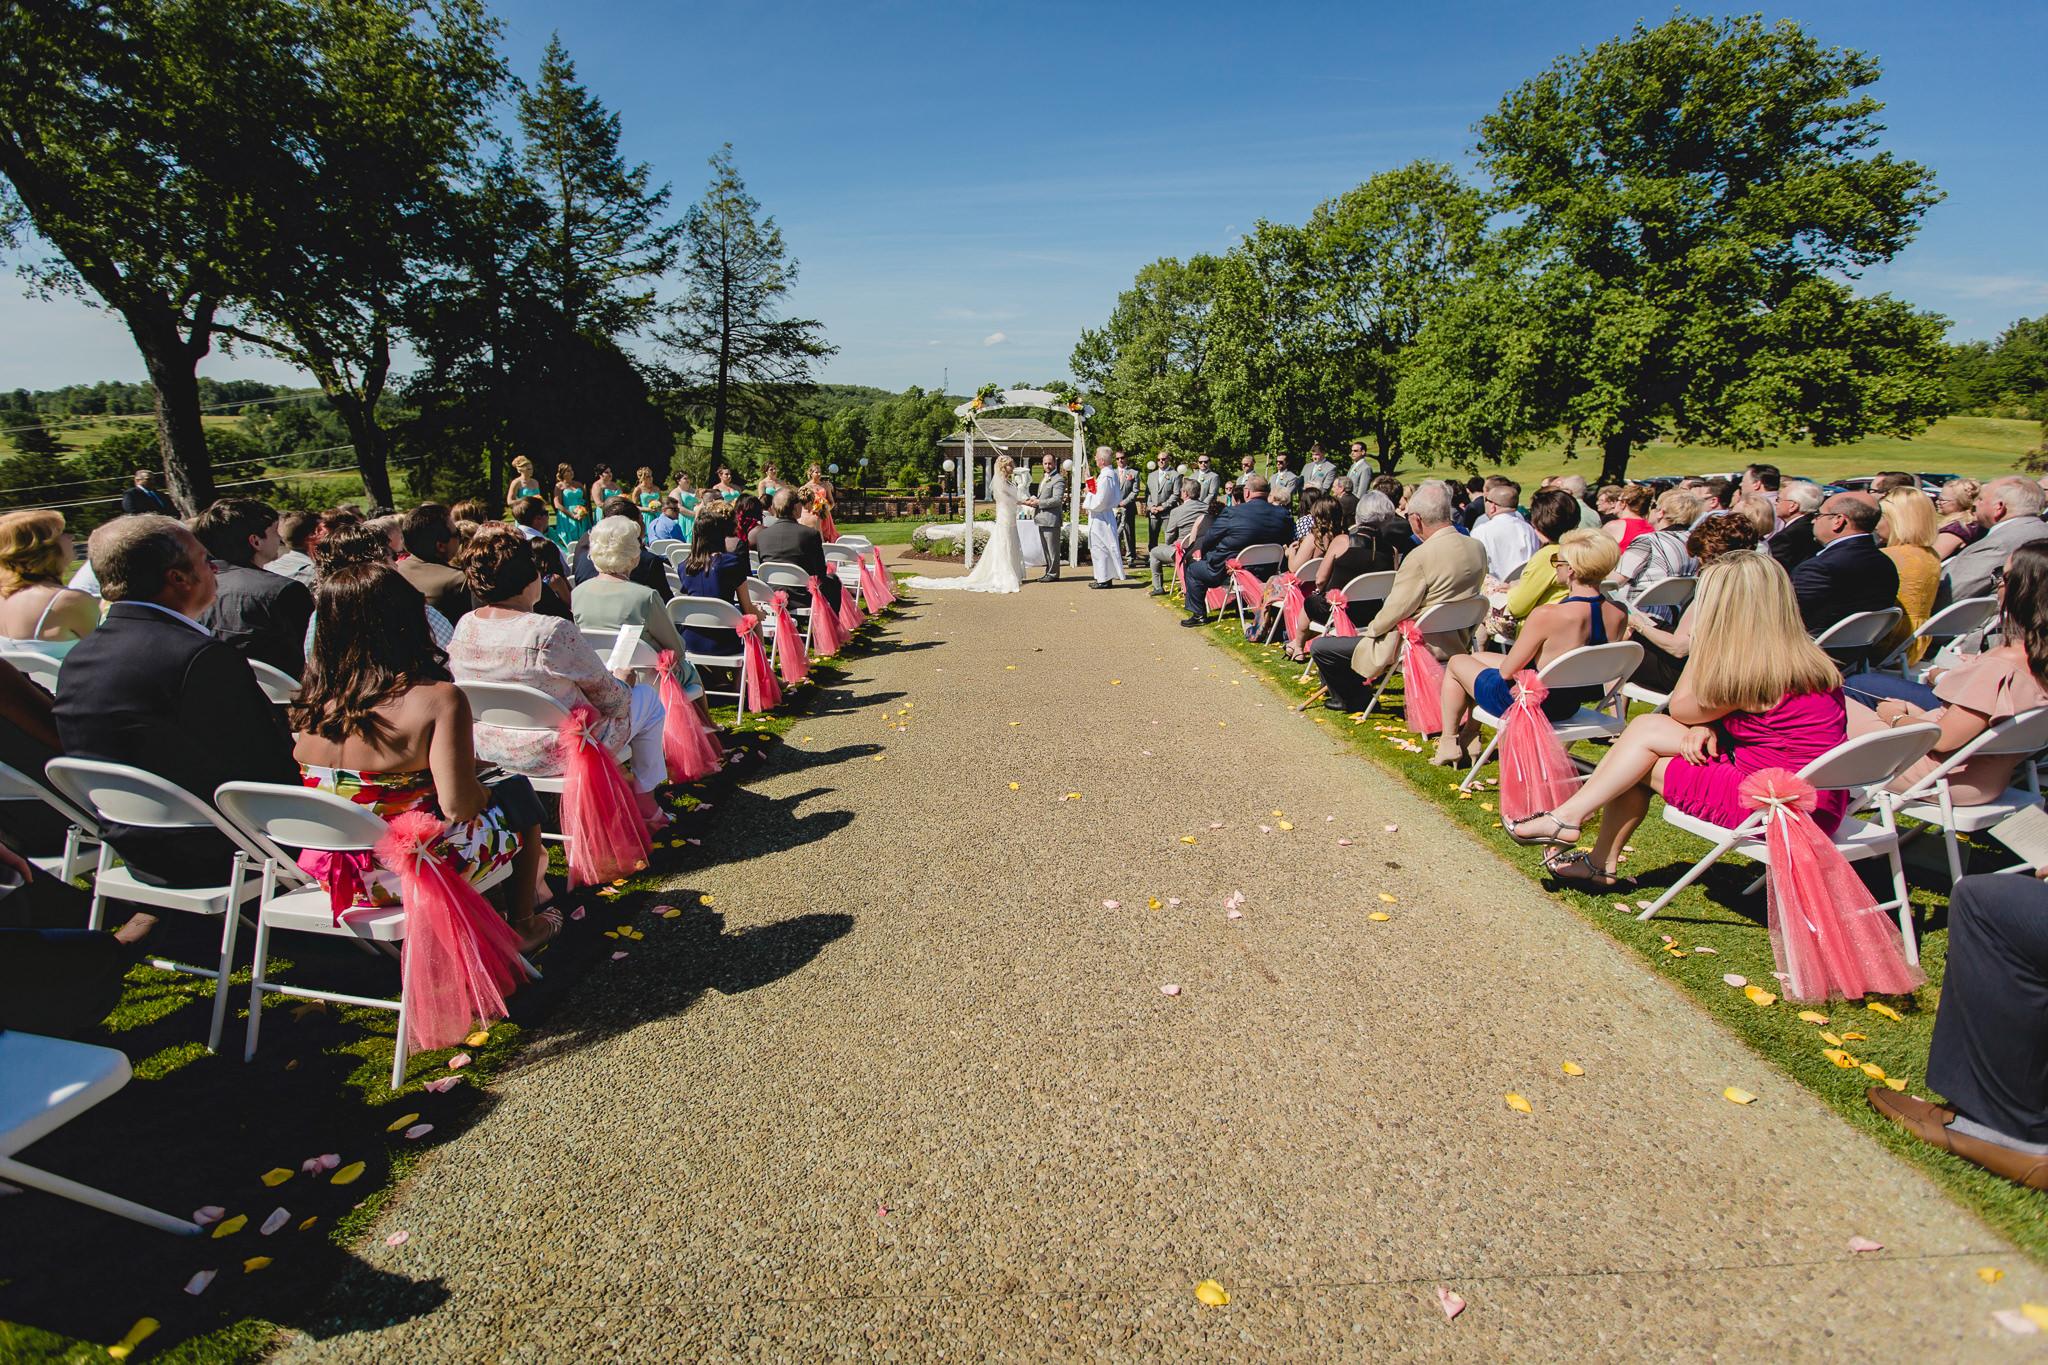 Outdoor wedding ceremony at Linden Hall